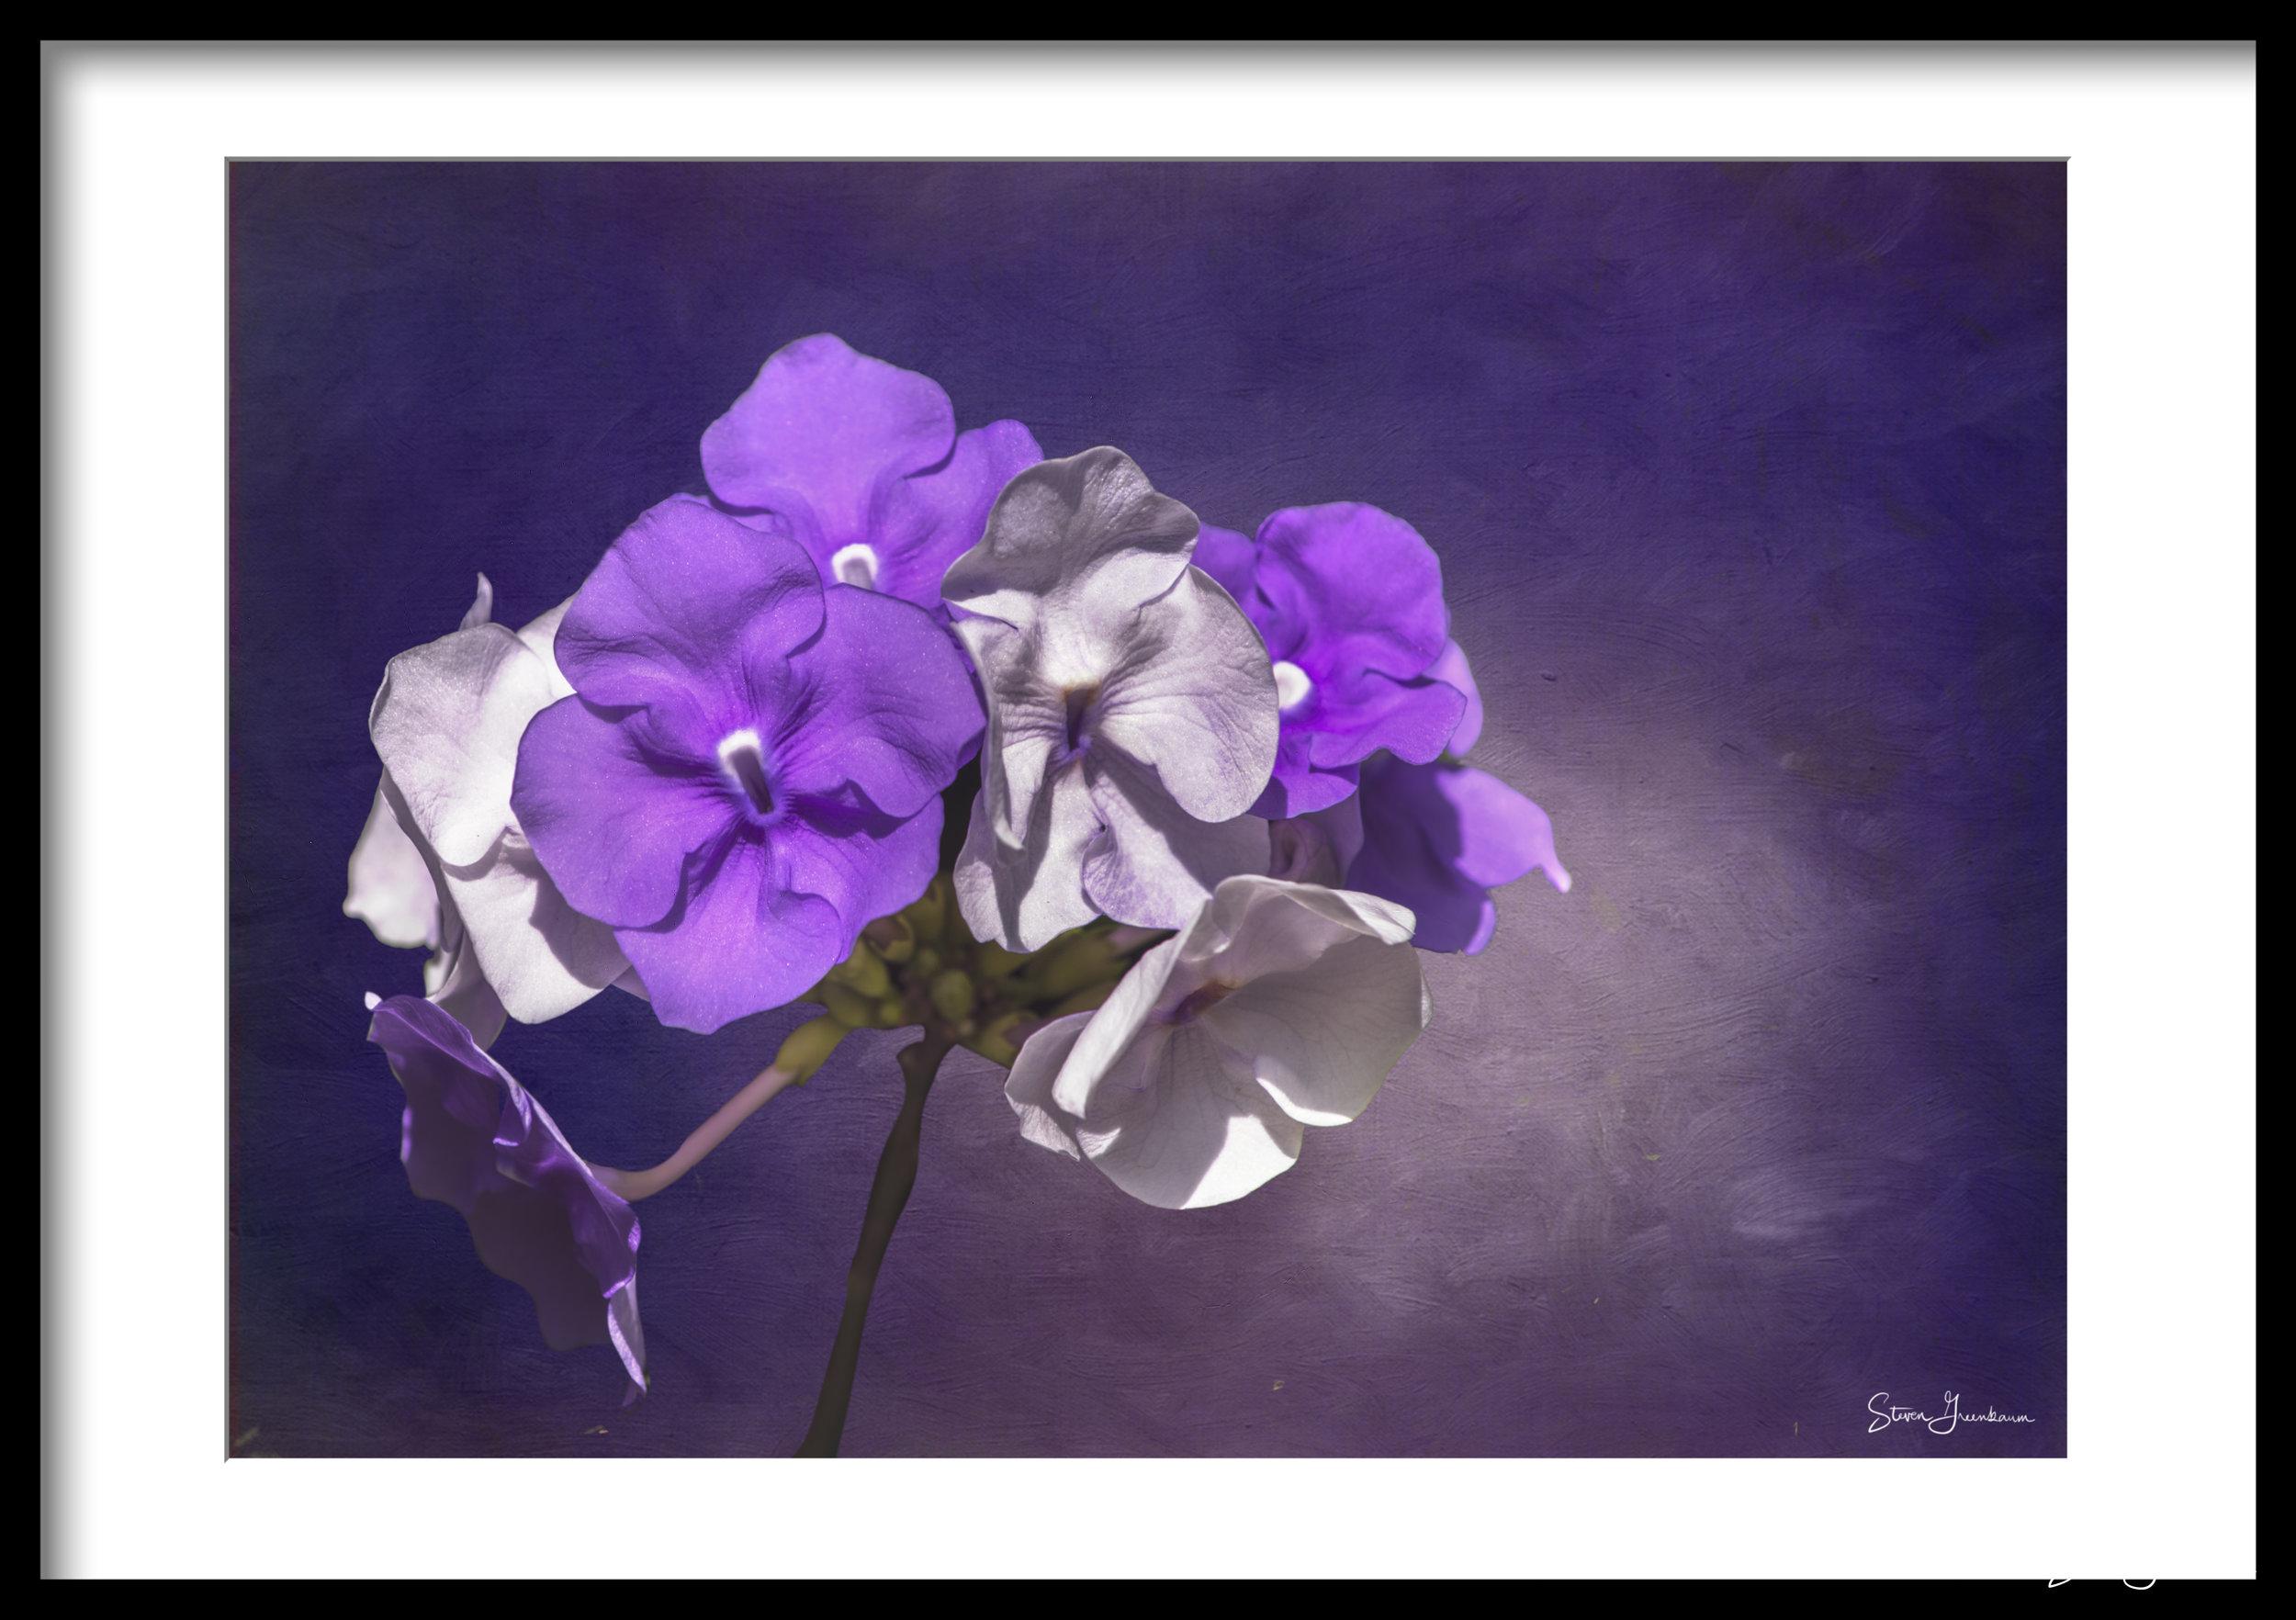 20140101_fairchild_0048-with background.jpg